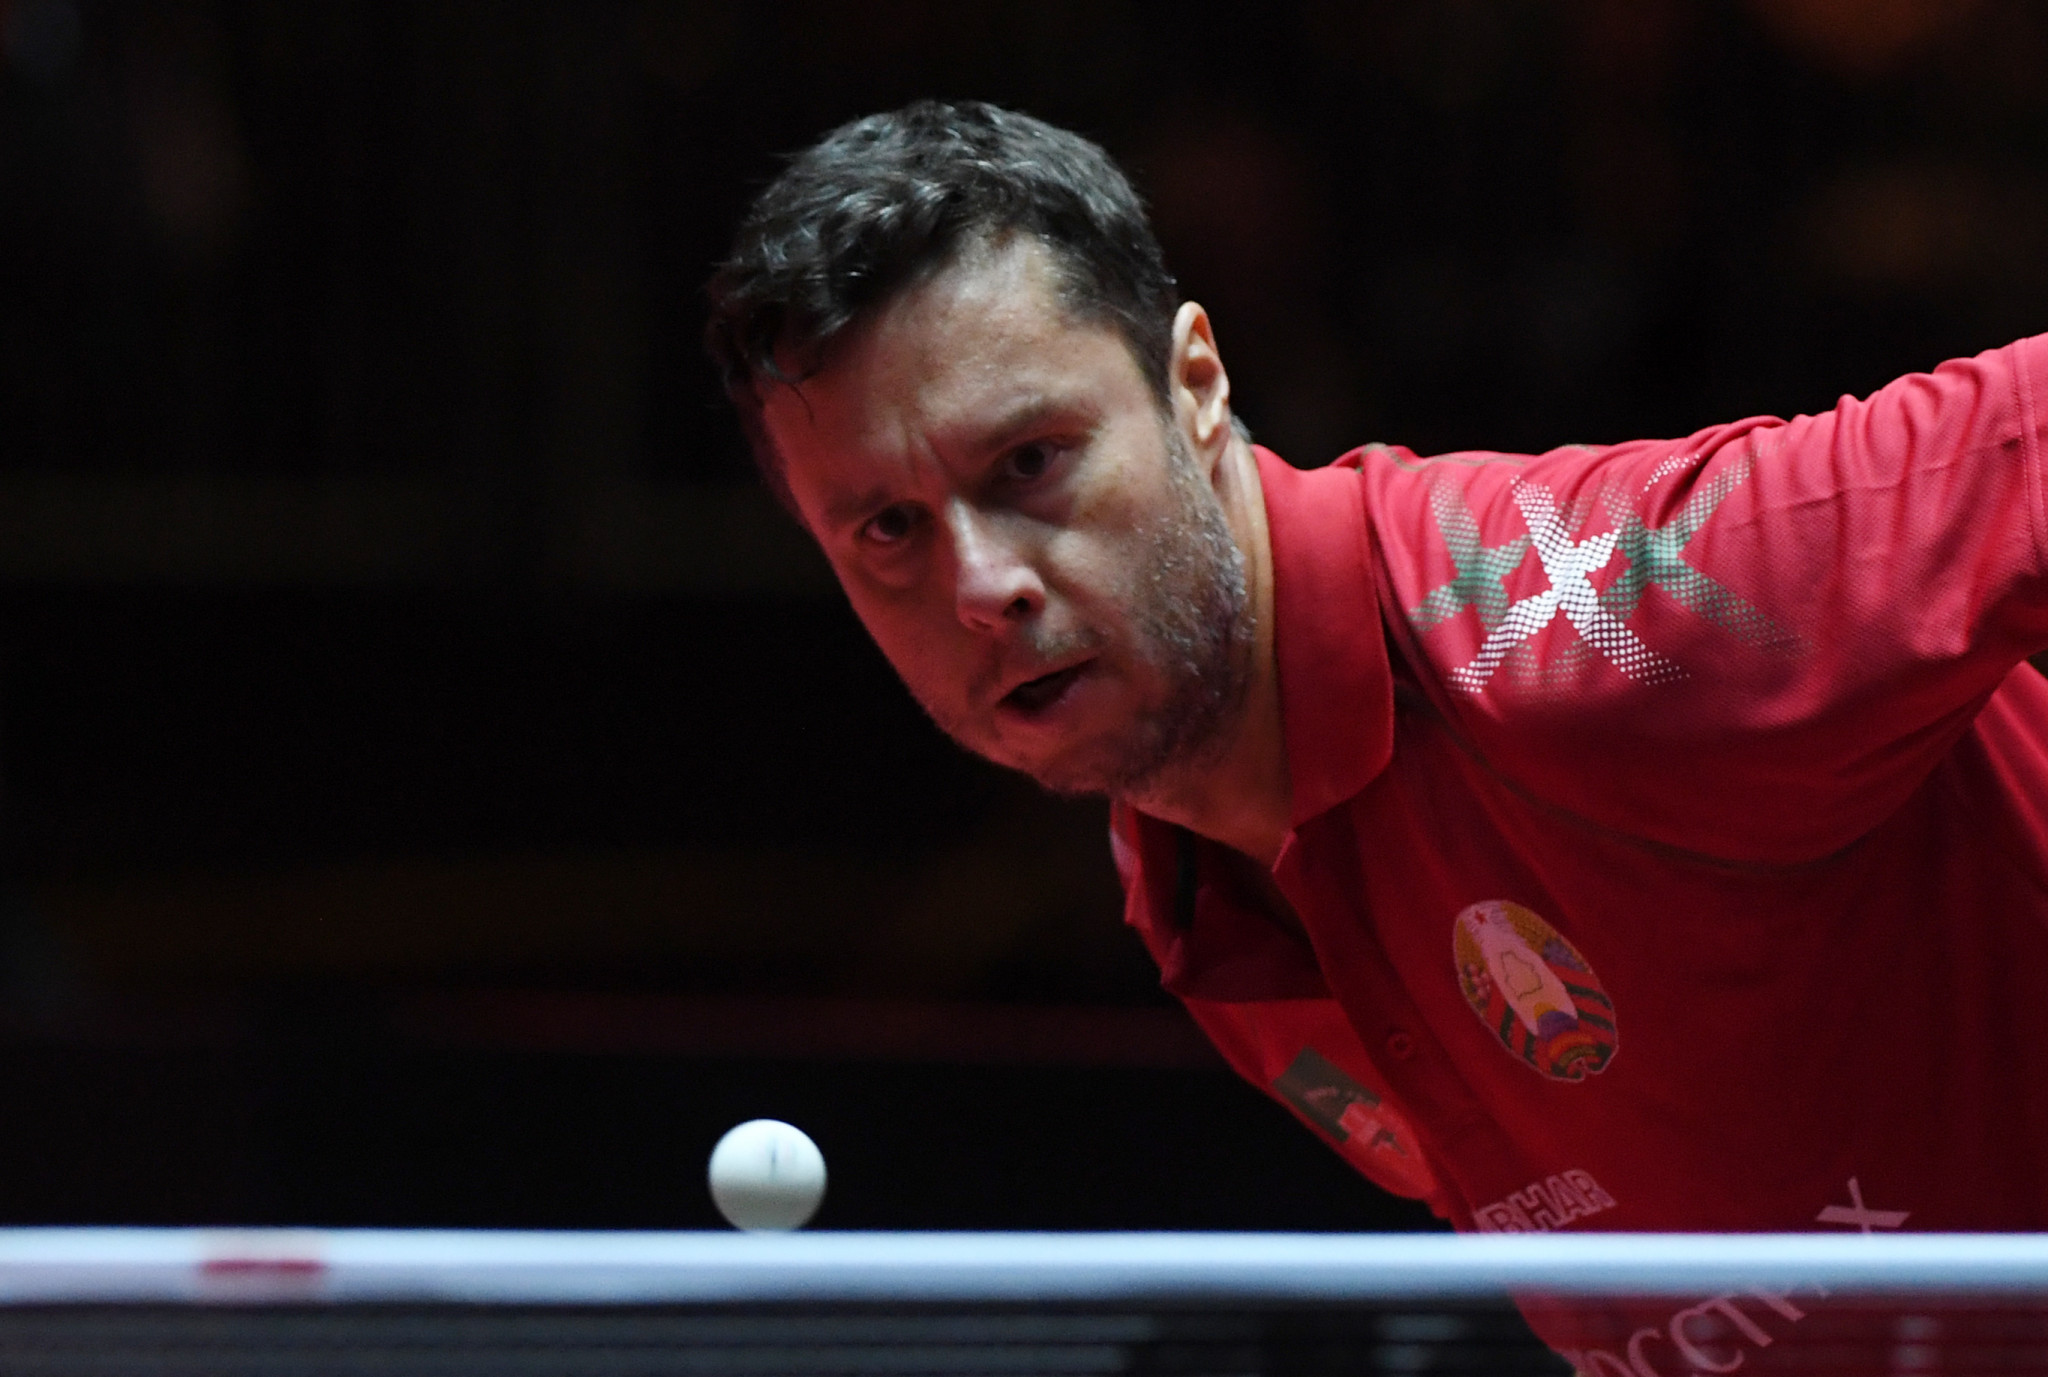 Samsonov fails to reach last 16 at ITTF Men's World Cup